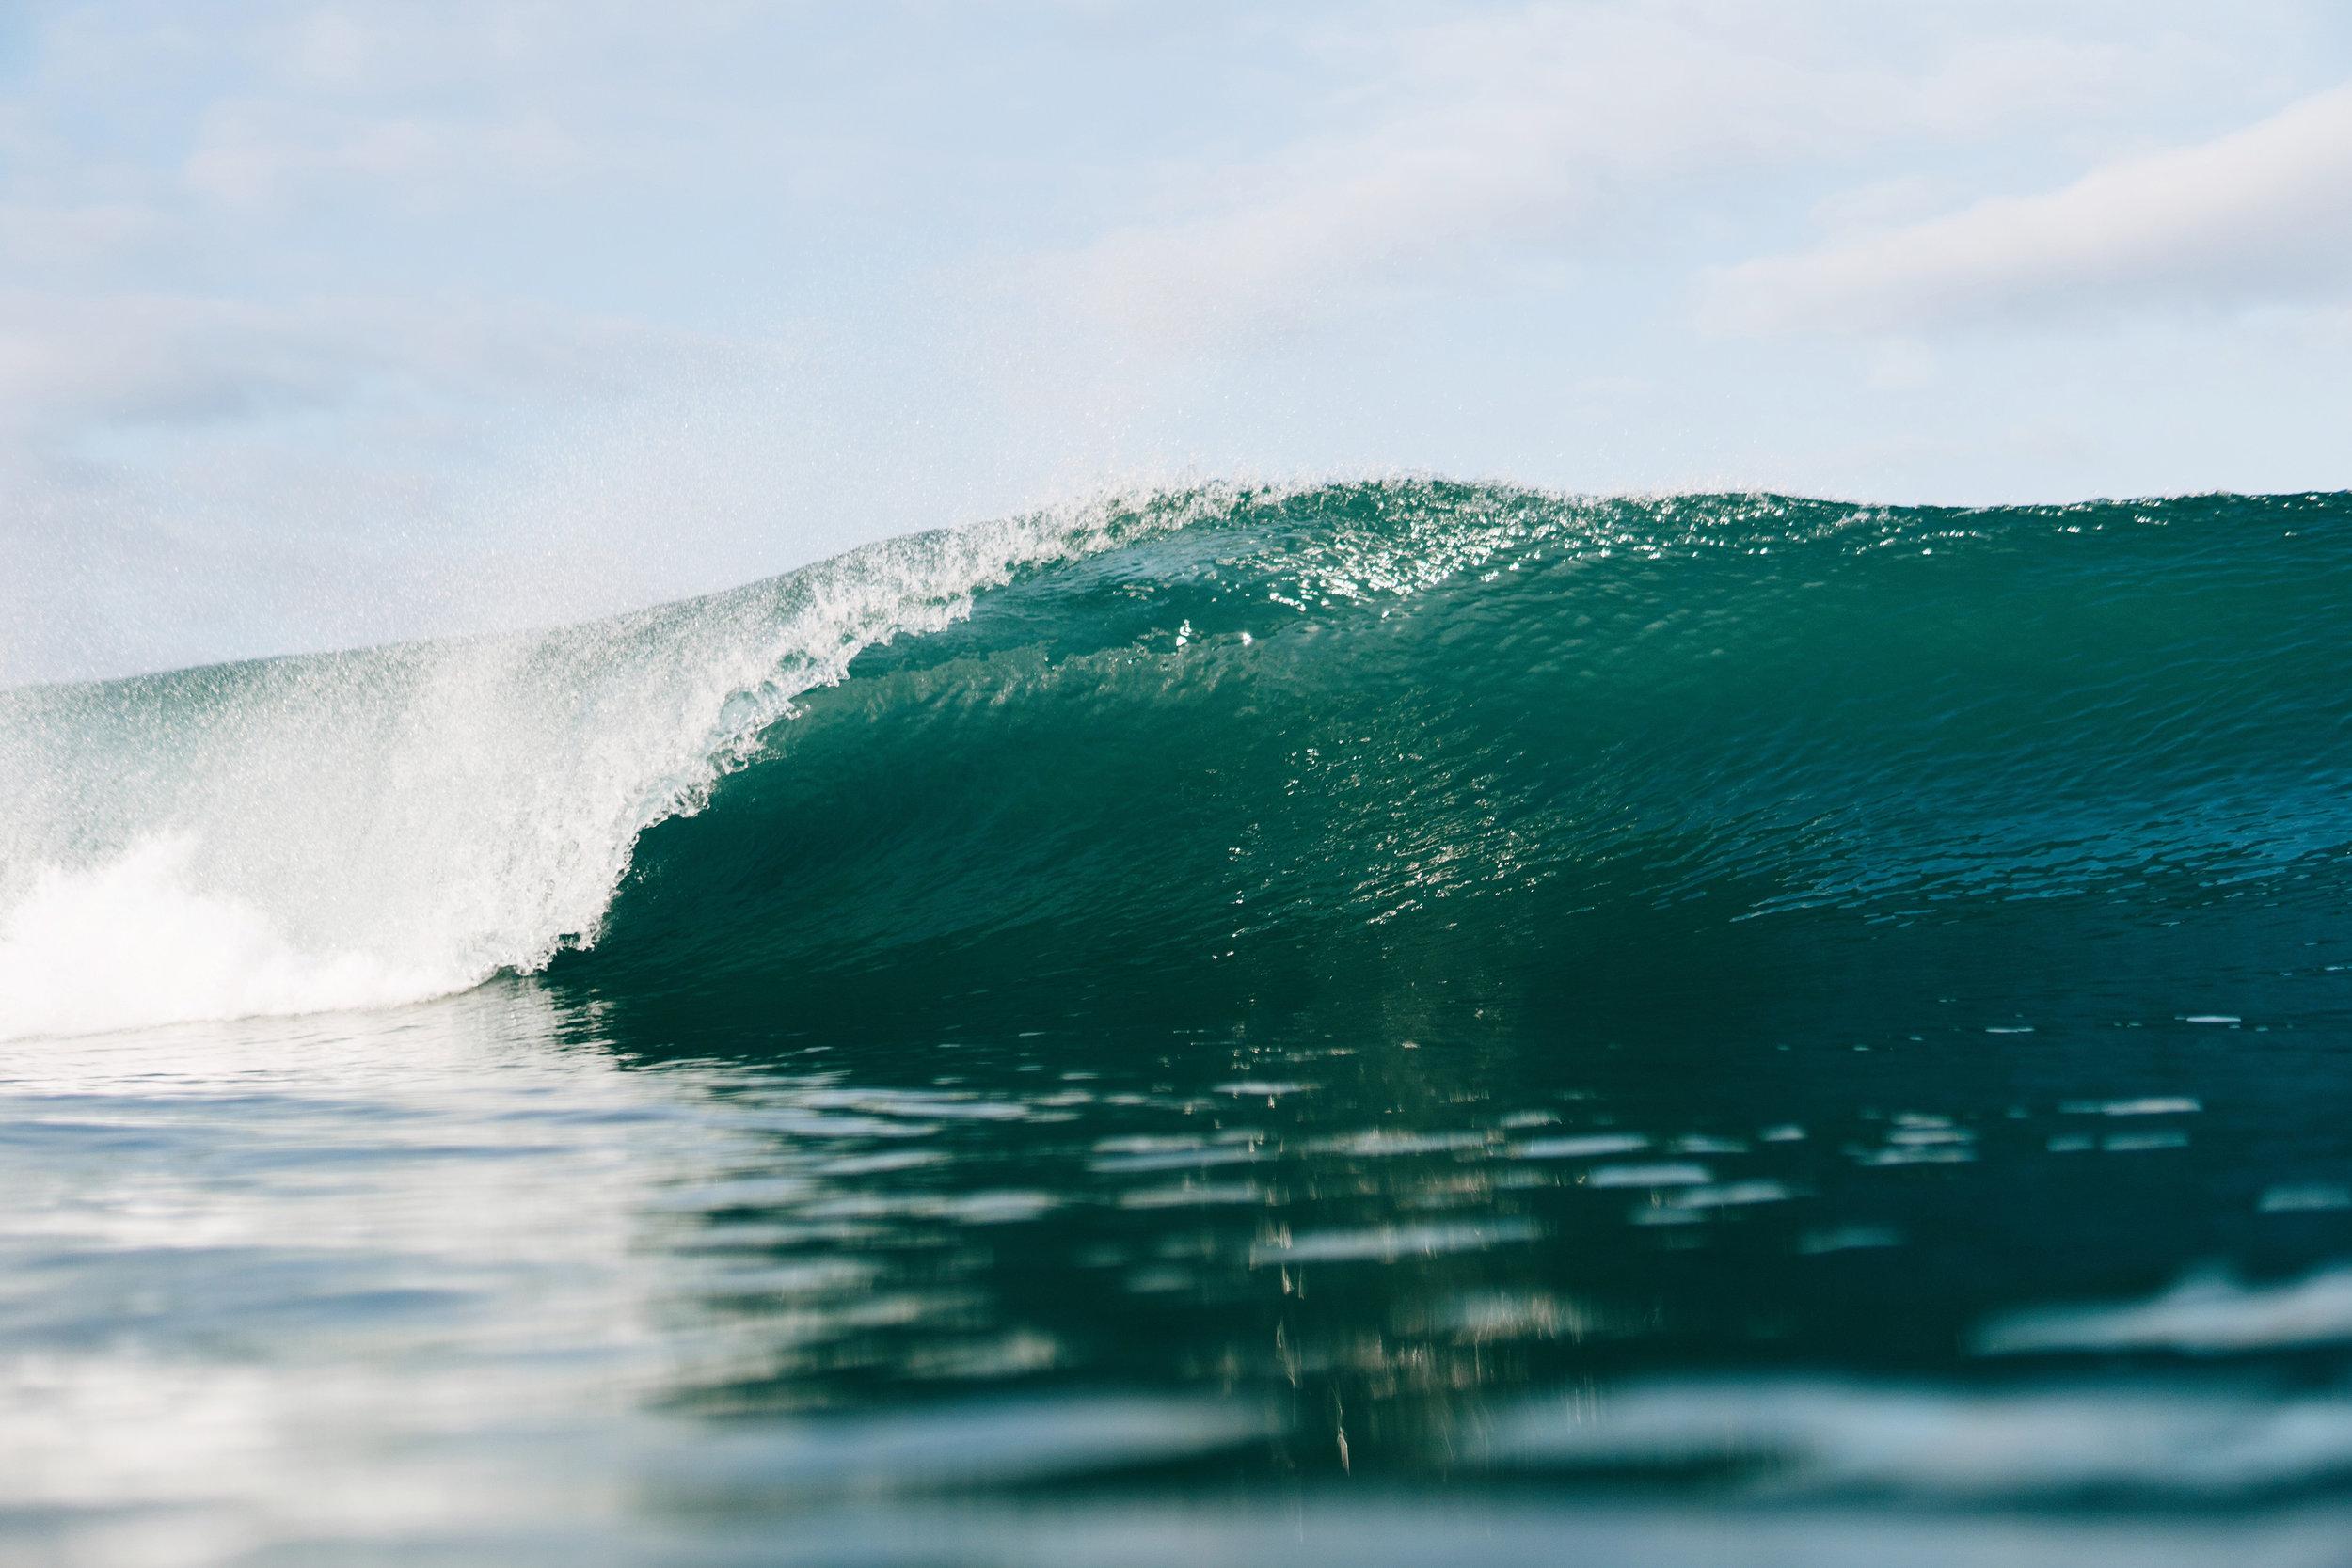 Sayulita-Mexico-Surf-Diego-Cadena-Kalle-Carranza-Dylan-Southworth-Gato-Rodriguez-Julien-Dorian-Gomez-Heiko-Bothe-15.jpg